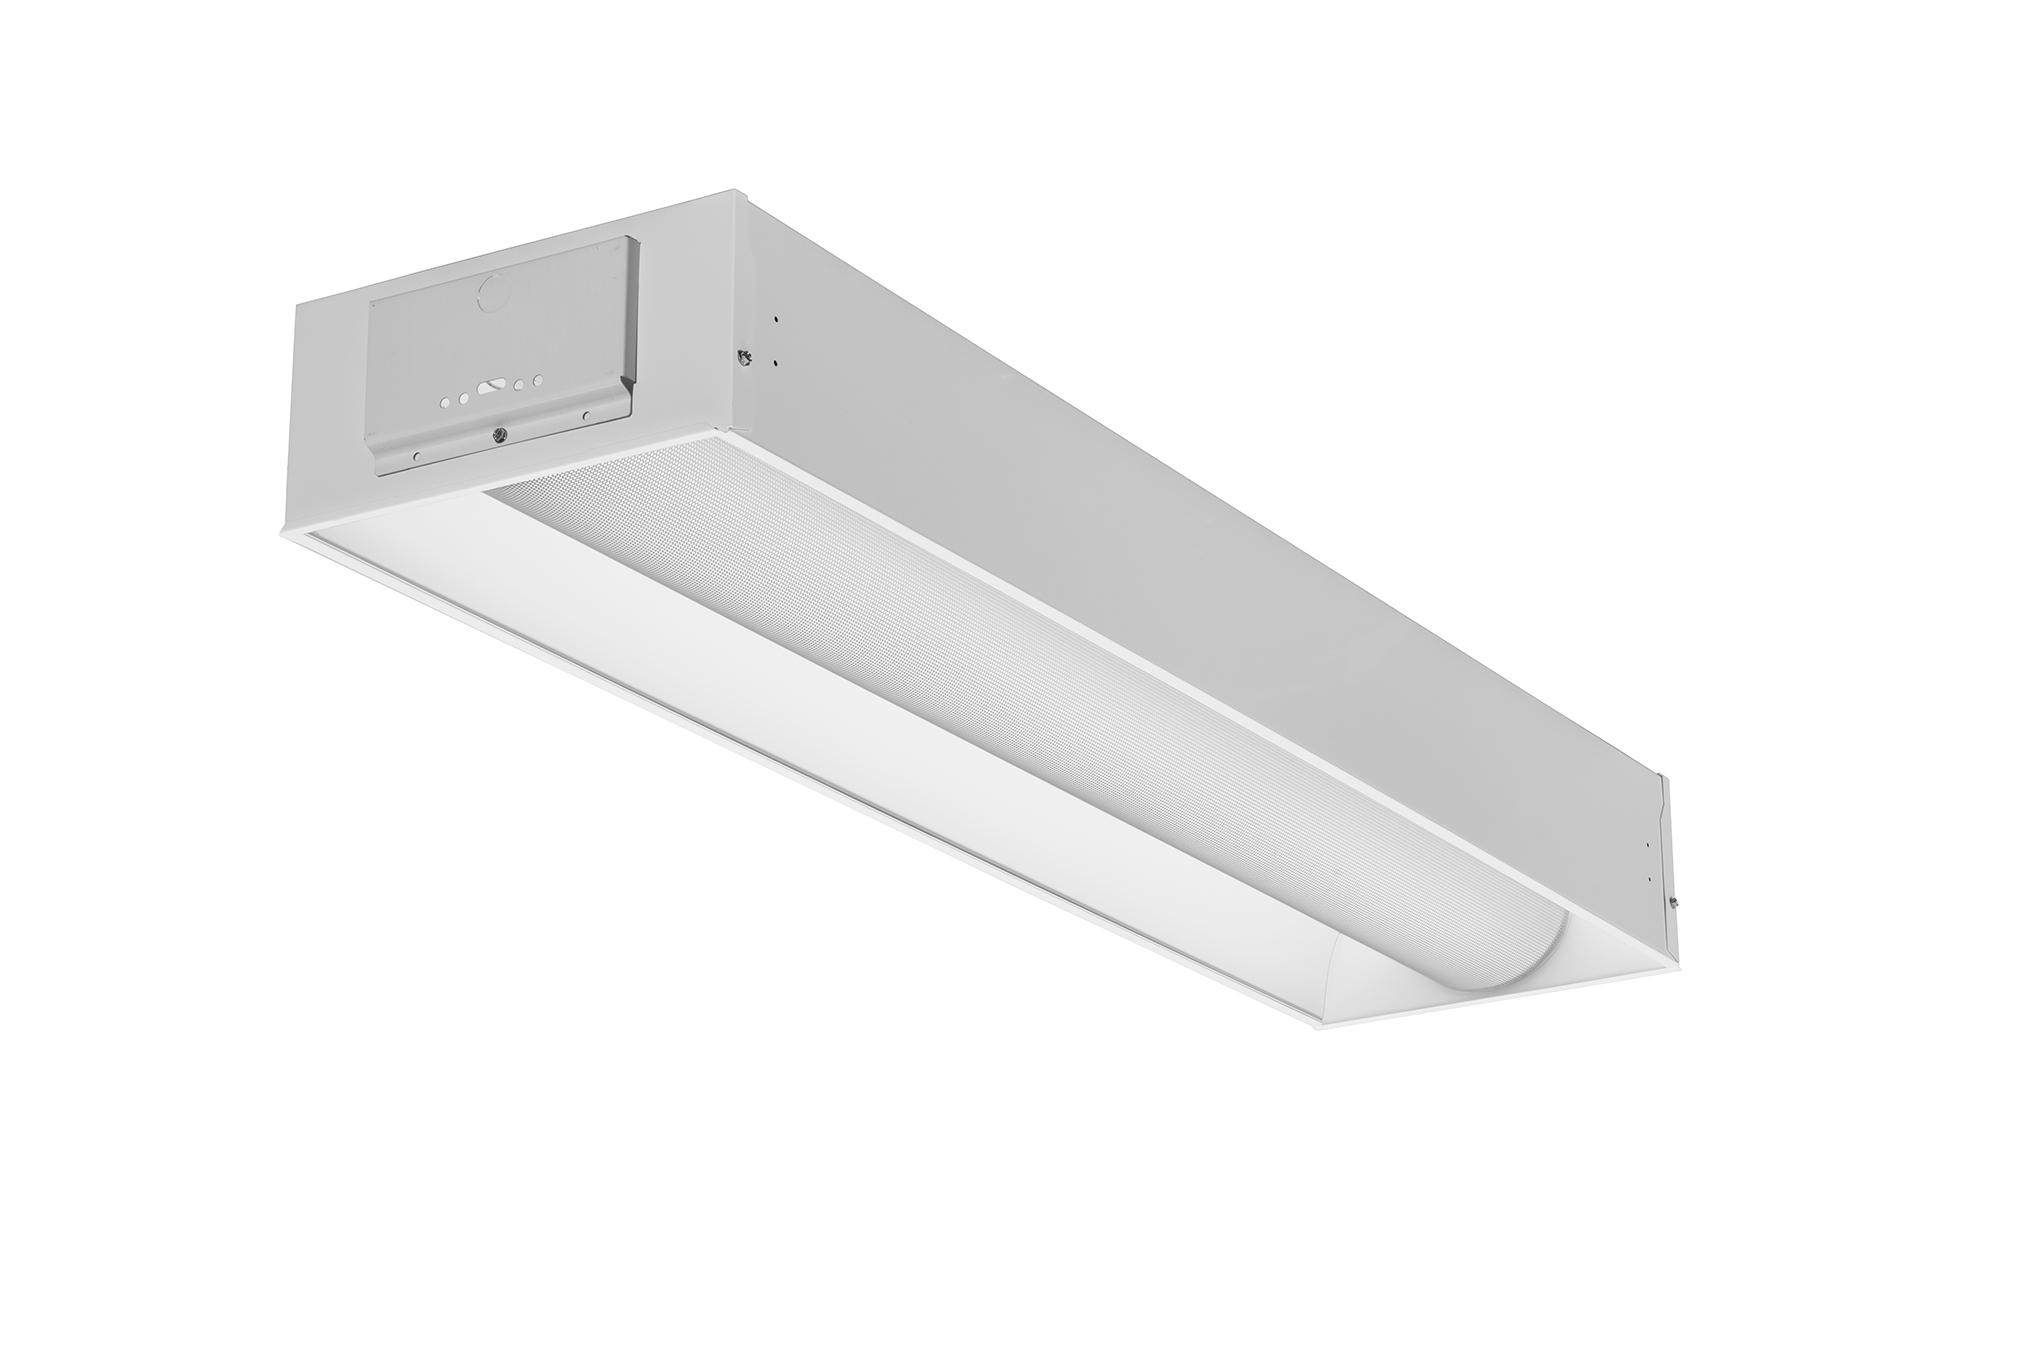 AVLED_AVLD 1x4 3 qtr standard illuminated